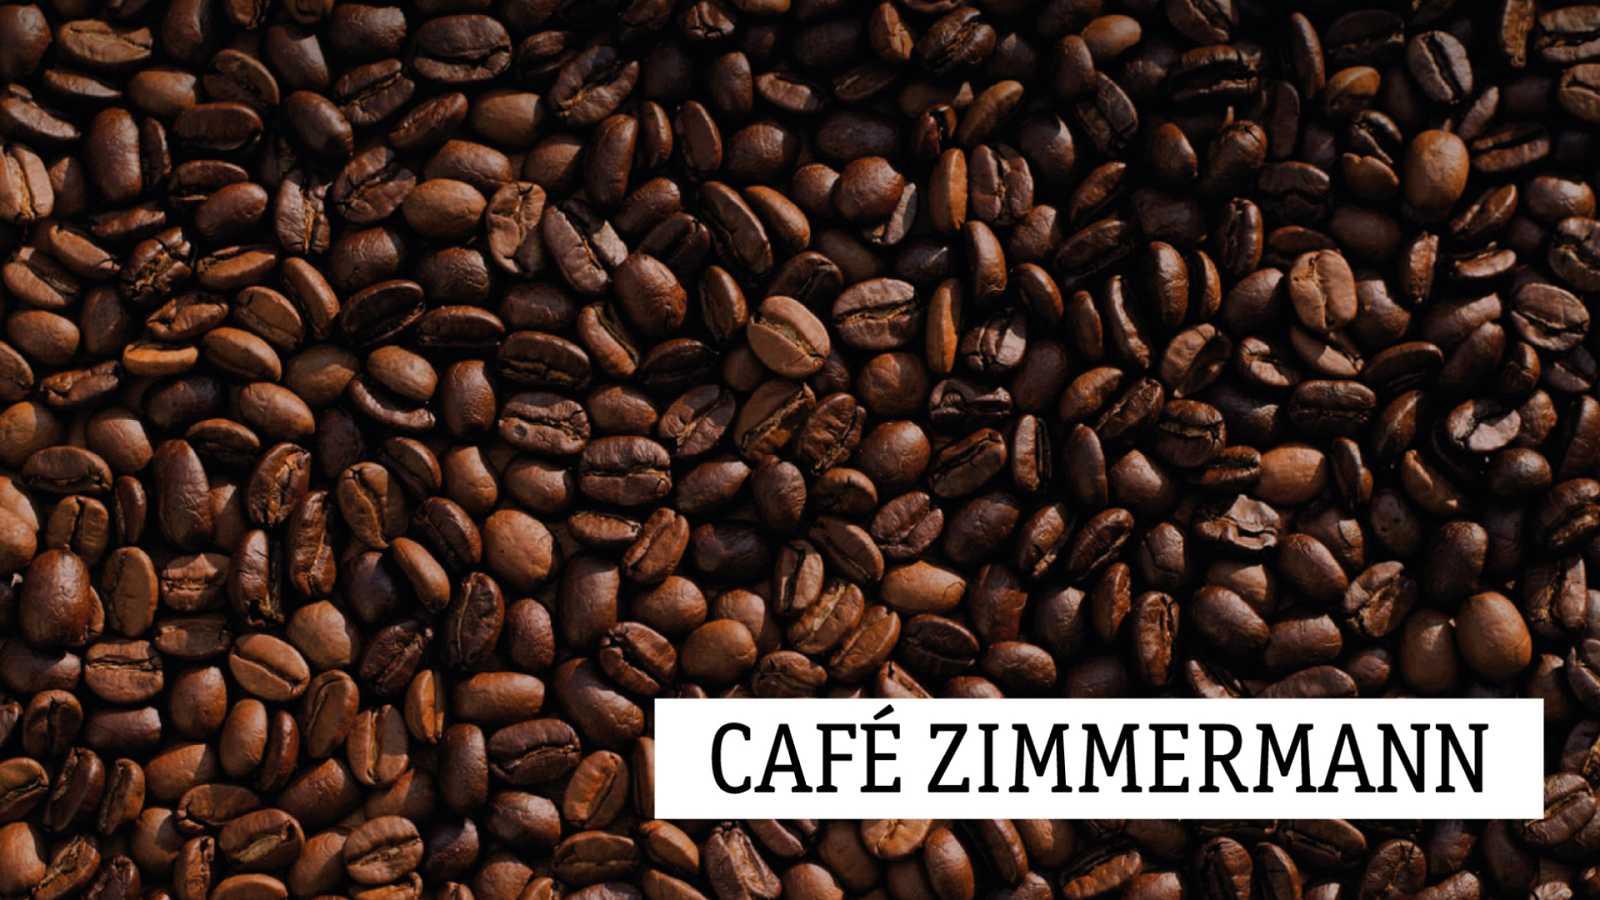 Café Zimmermann - Premios Nobel - 13/10/20 - escuchar ahora